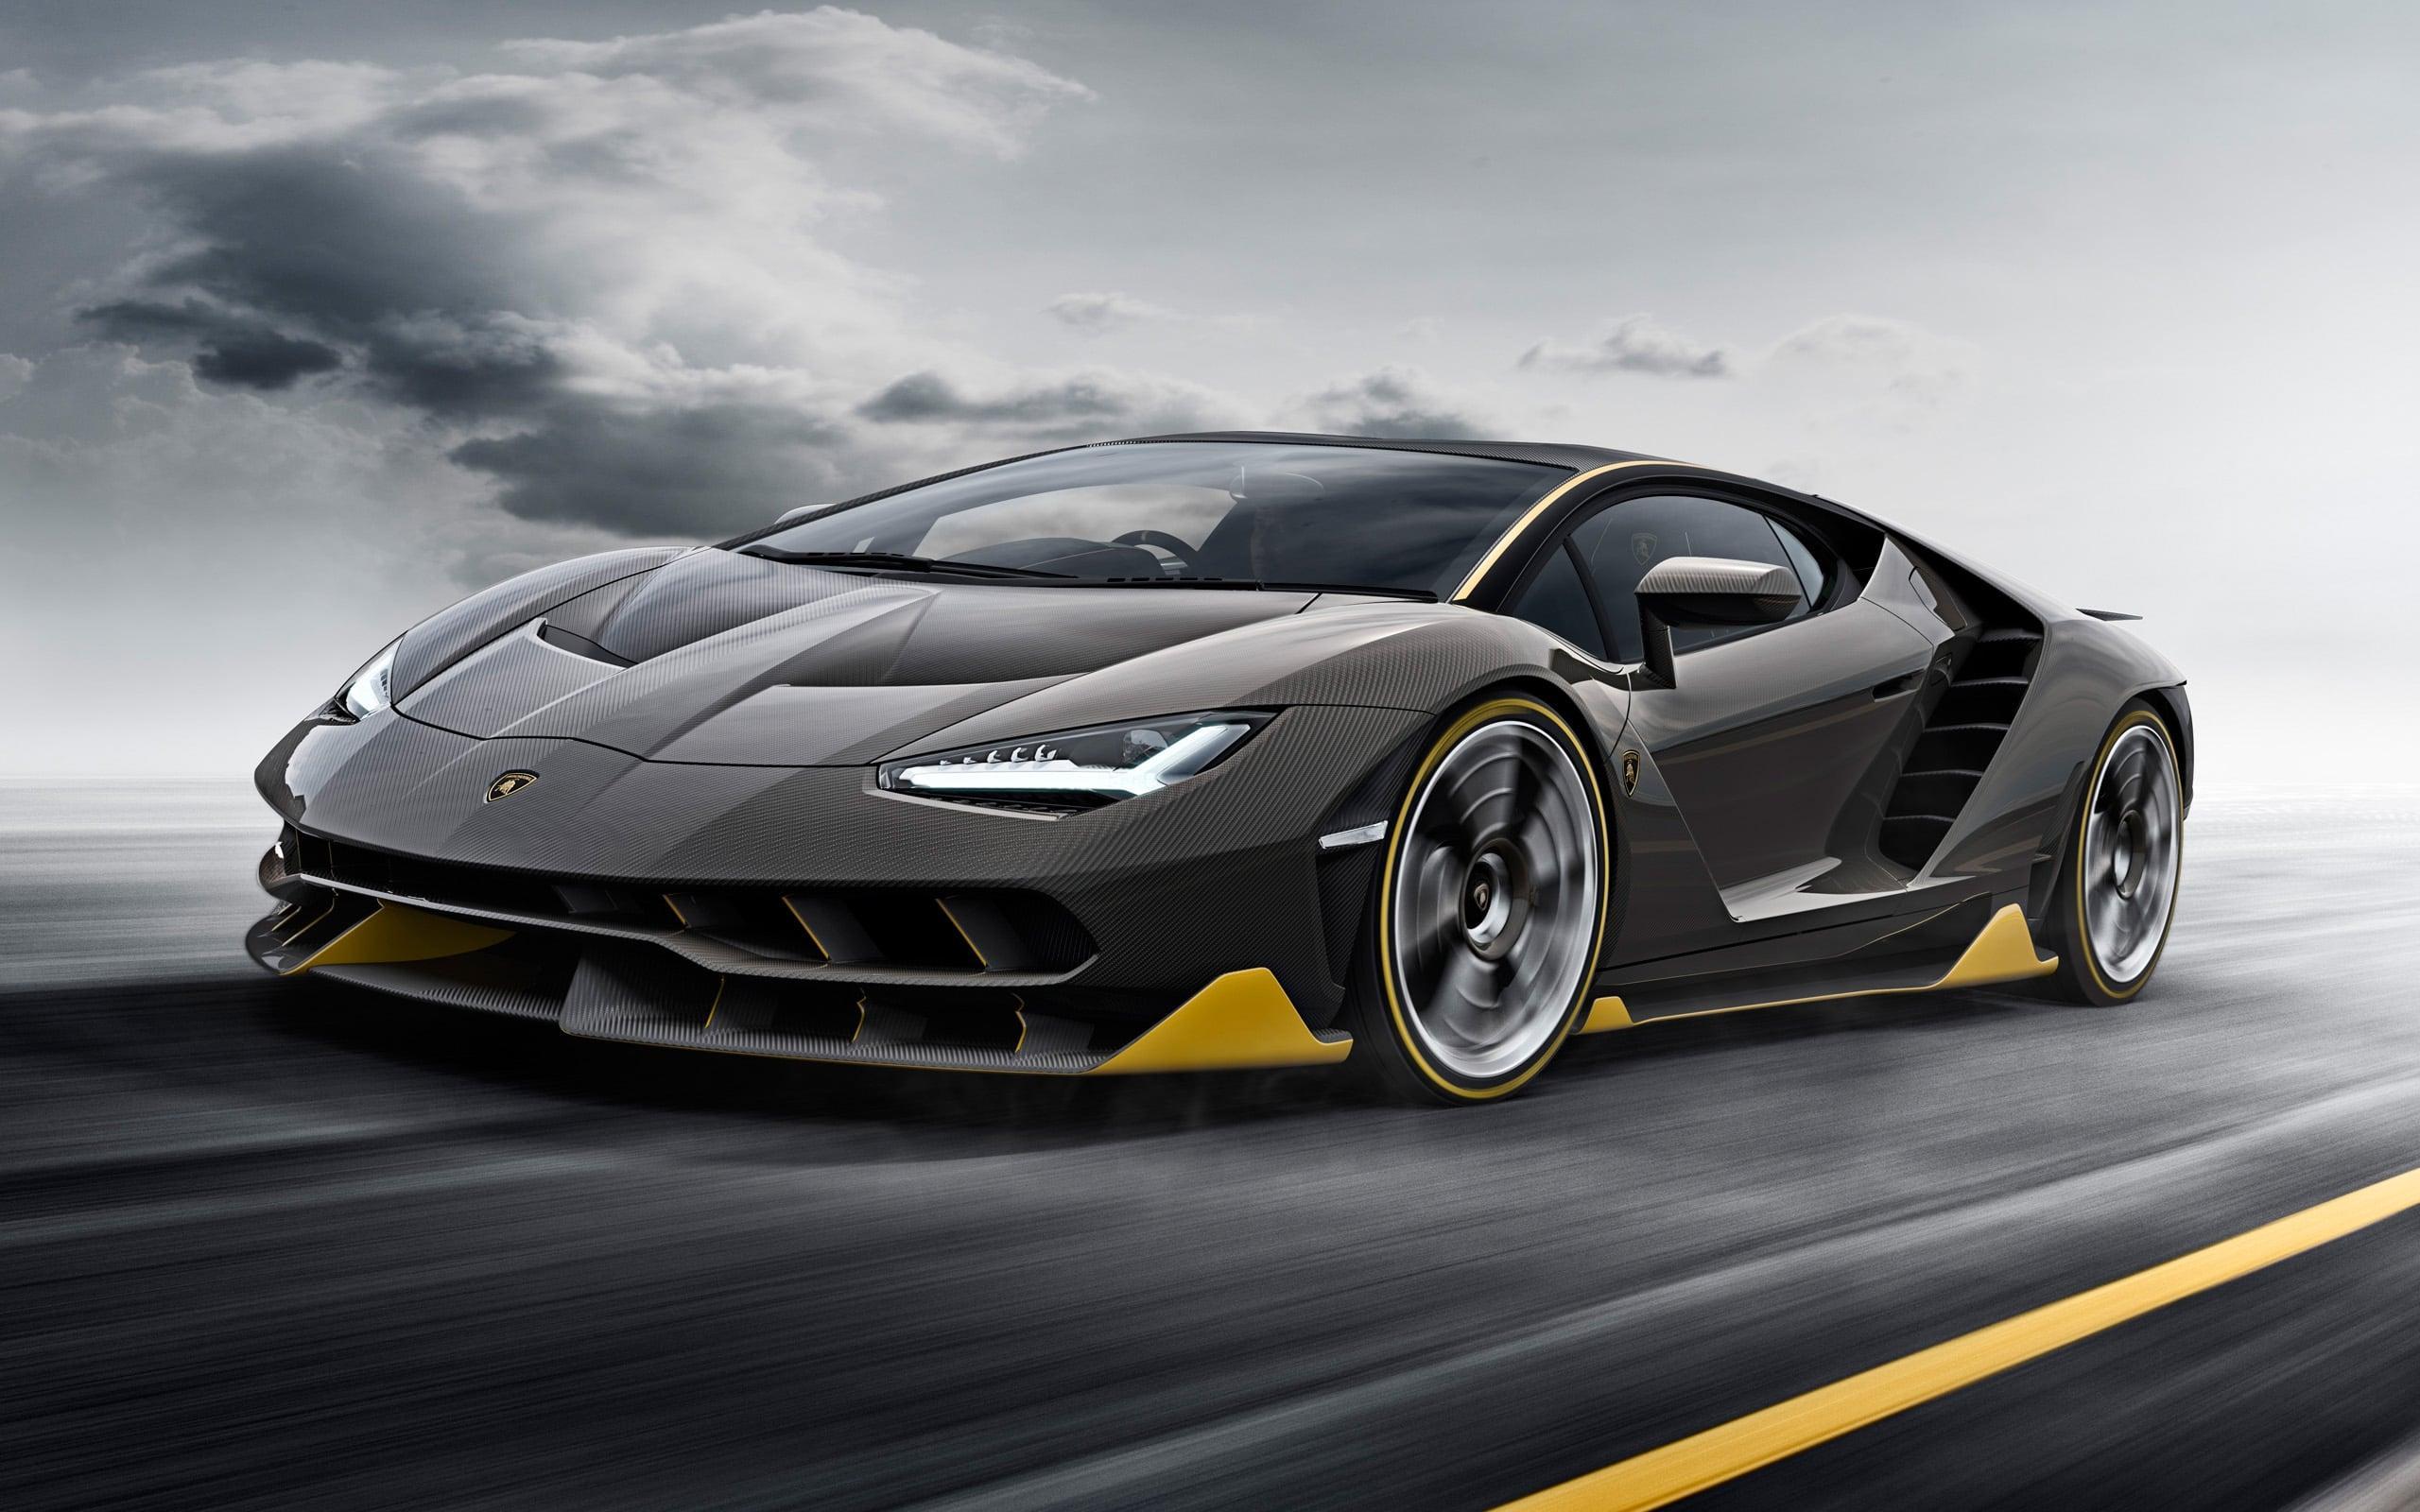 Neon Lamborghini Wallpapers Top Free Neon Lamborghini Backgrounds